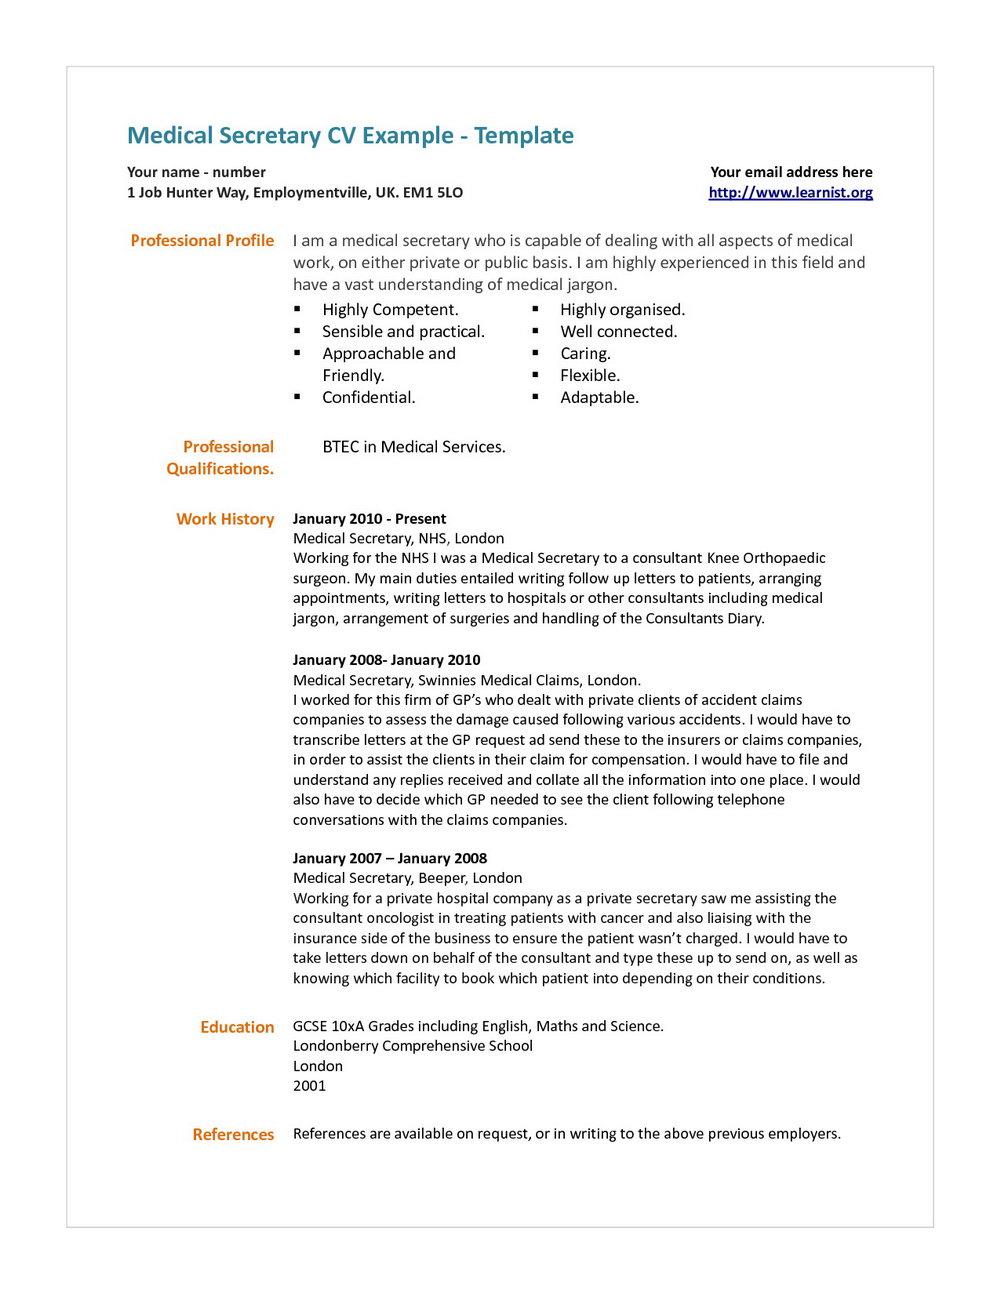 Medical Secretary Resume Template